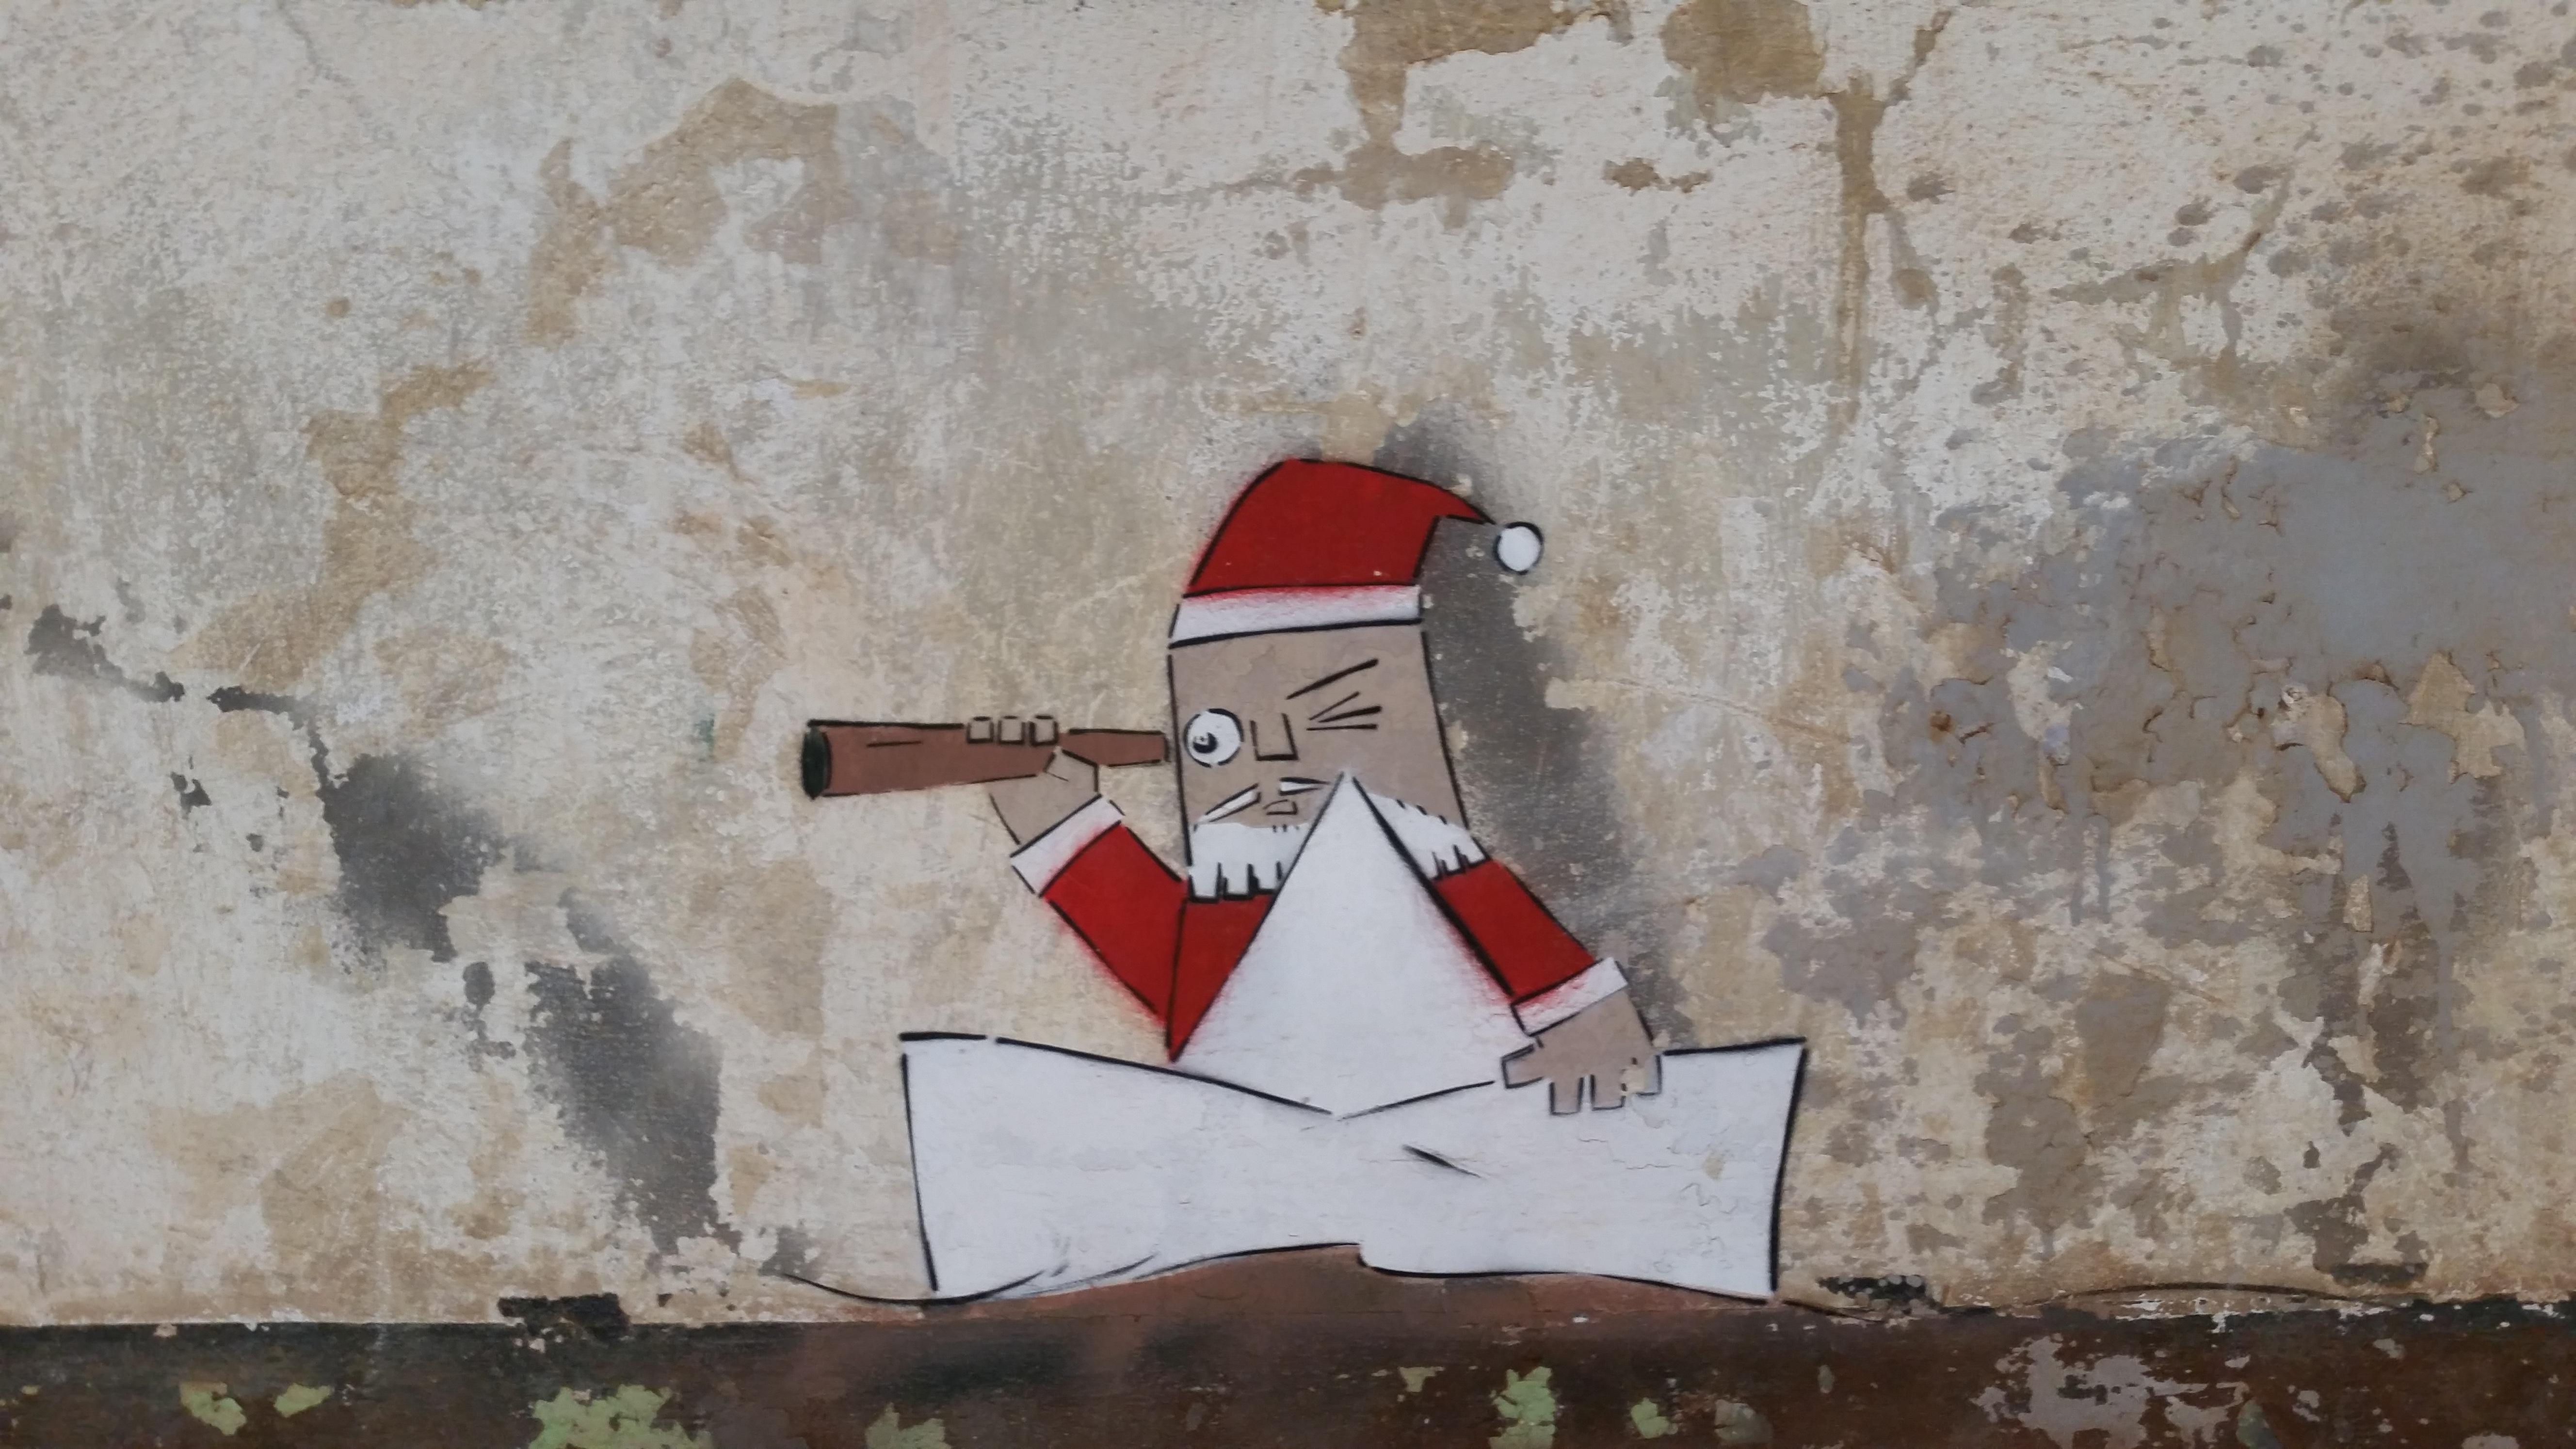 street urban wall red spray artistic paint grunge graffiti painting street  art art design cool style